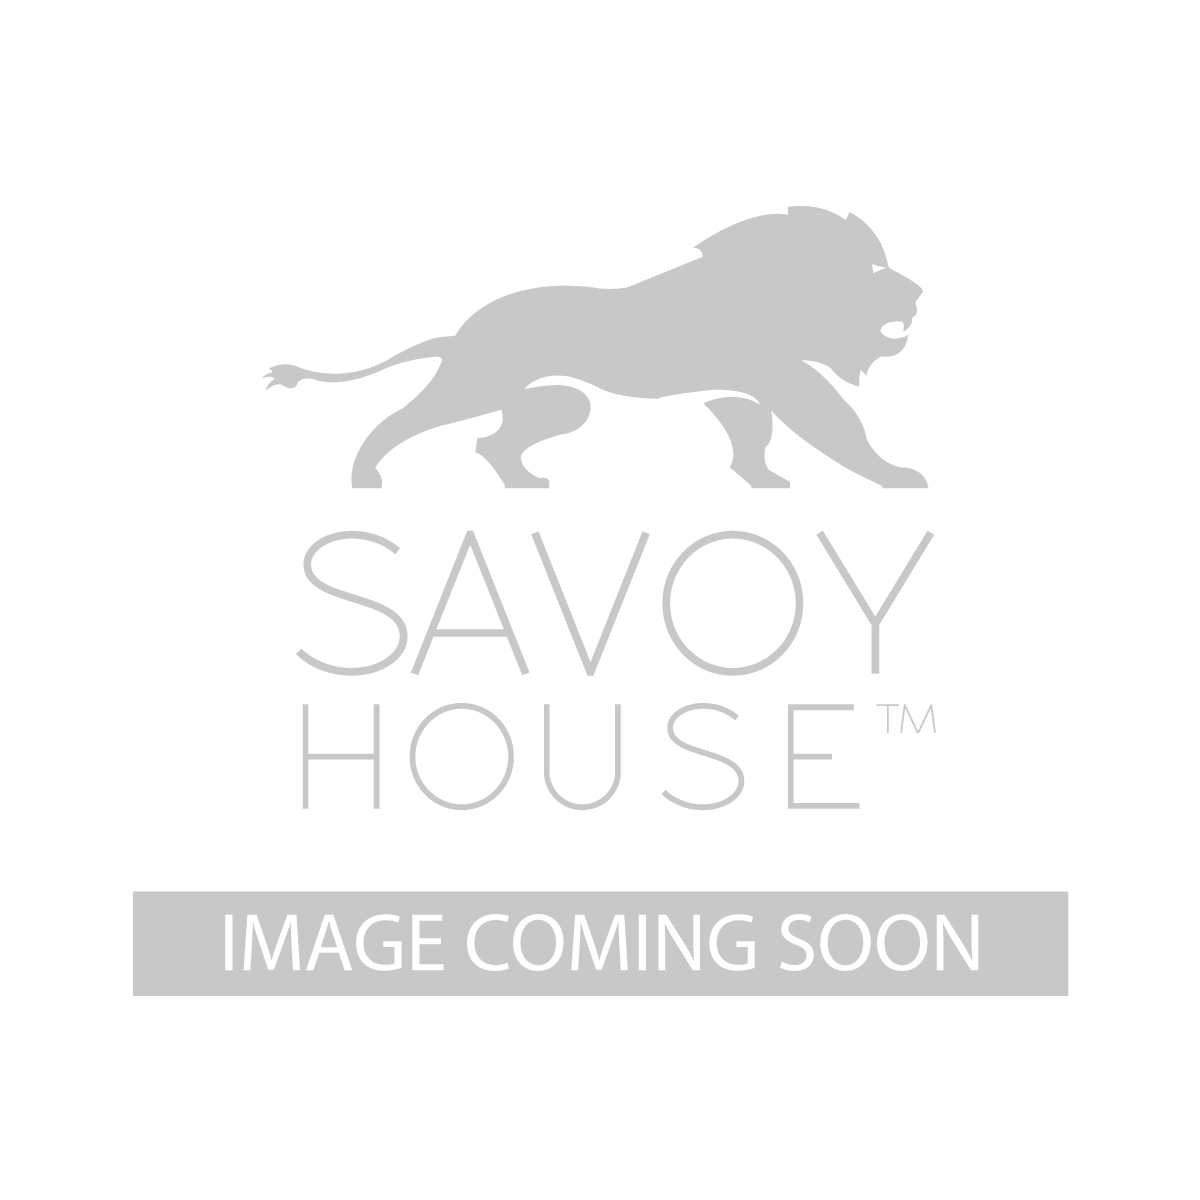 7 6099 24 109 galea 24 light chandelier by savoy house for Www savoyhouse com